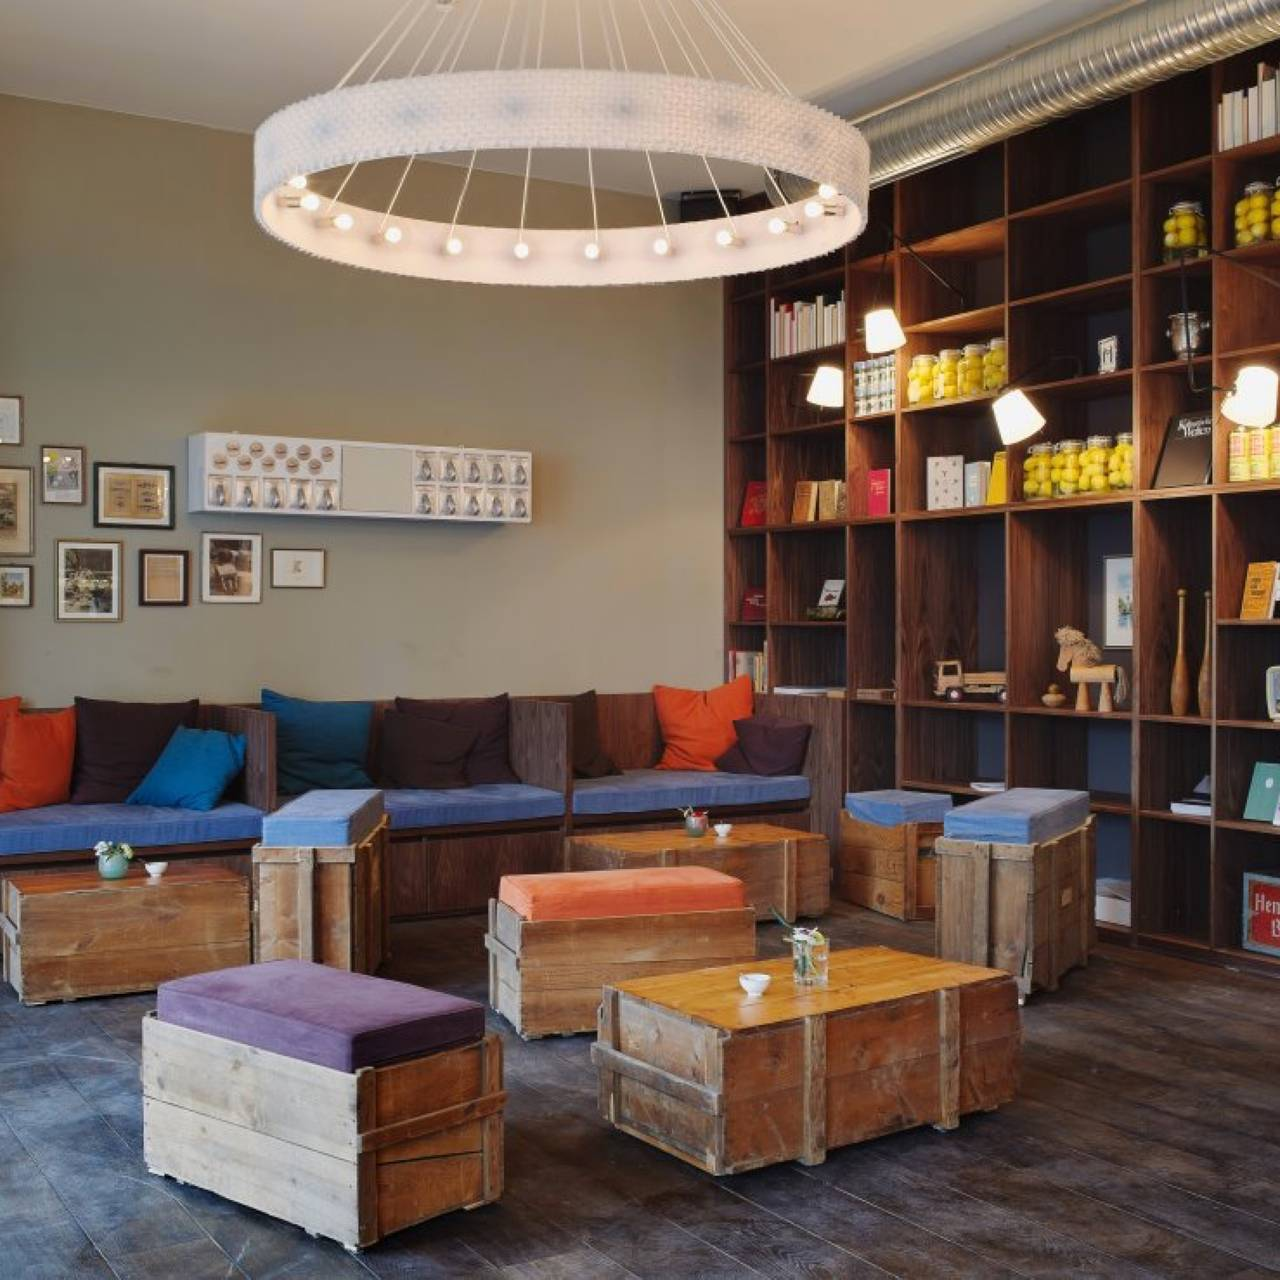 moderne deutsche k che frankfurt k che arbeitsplatte naturstein transportieren f e ikea rot. Black Bedroom Furniture Sets. Home Design Ideas